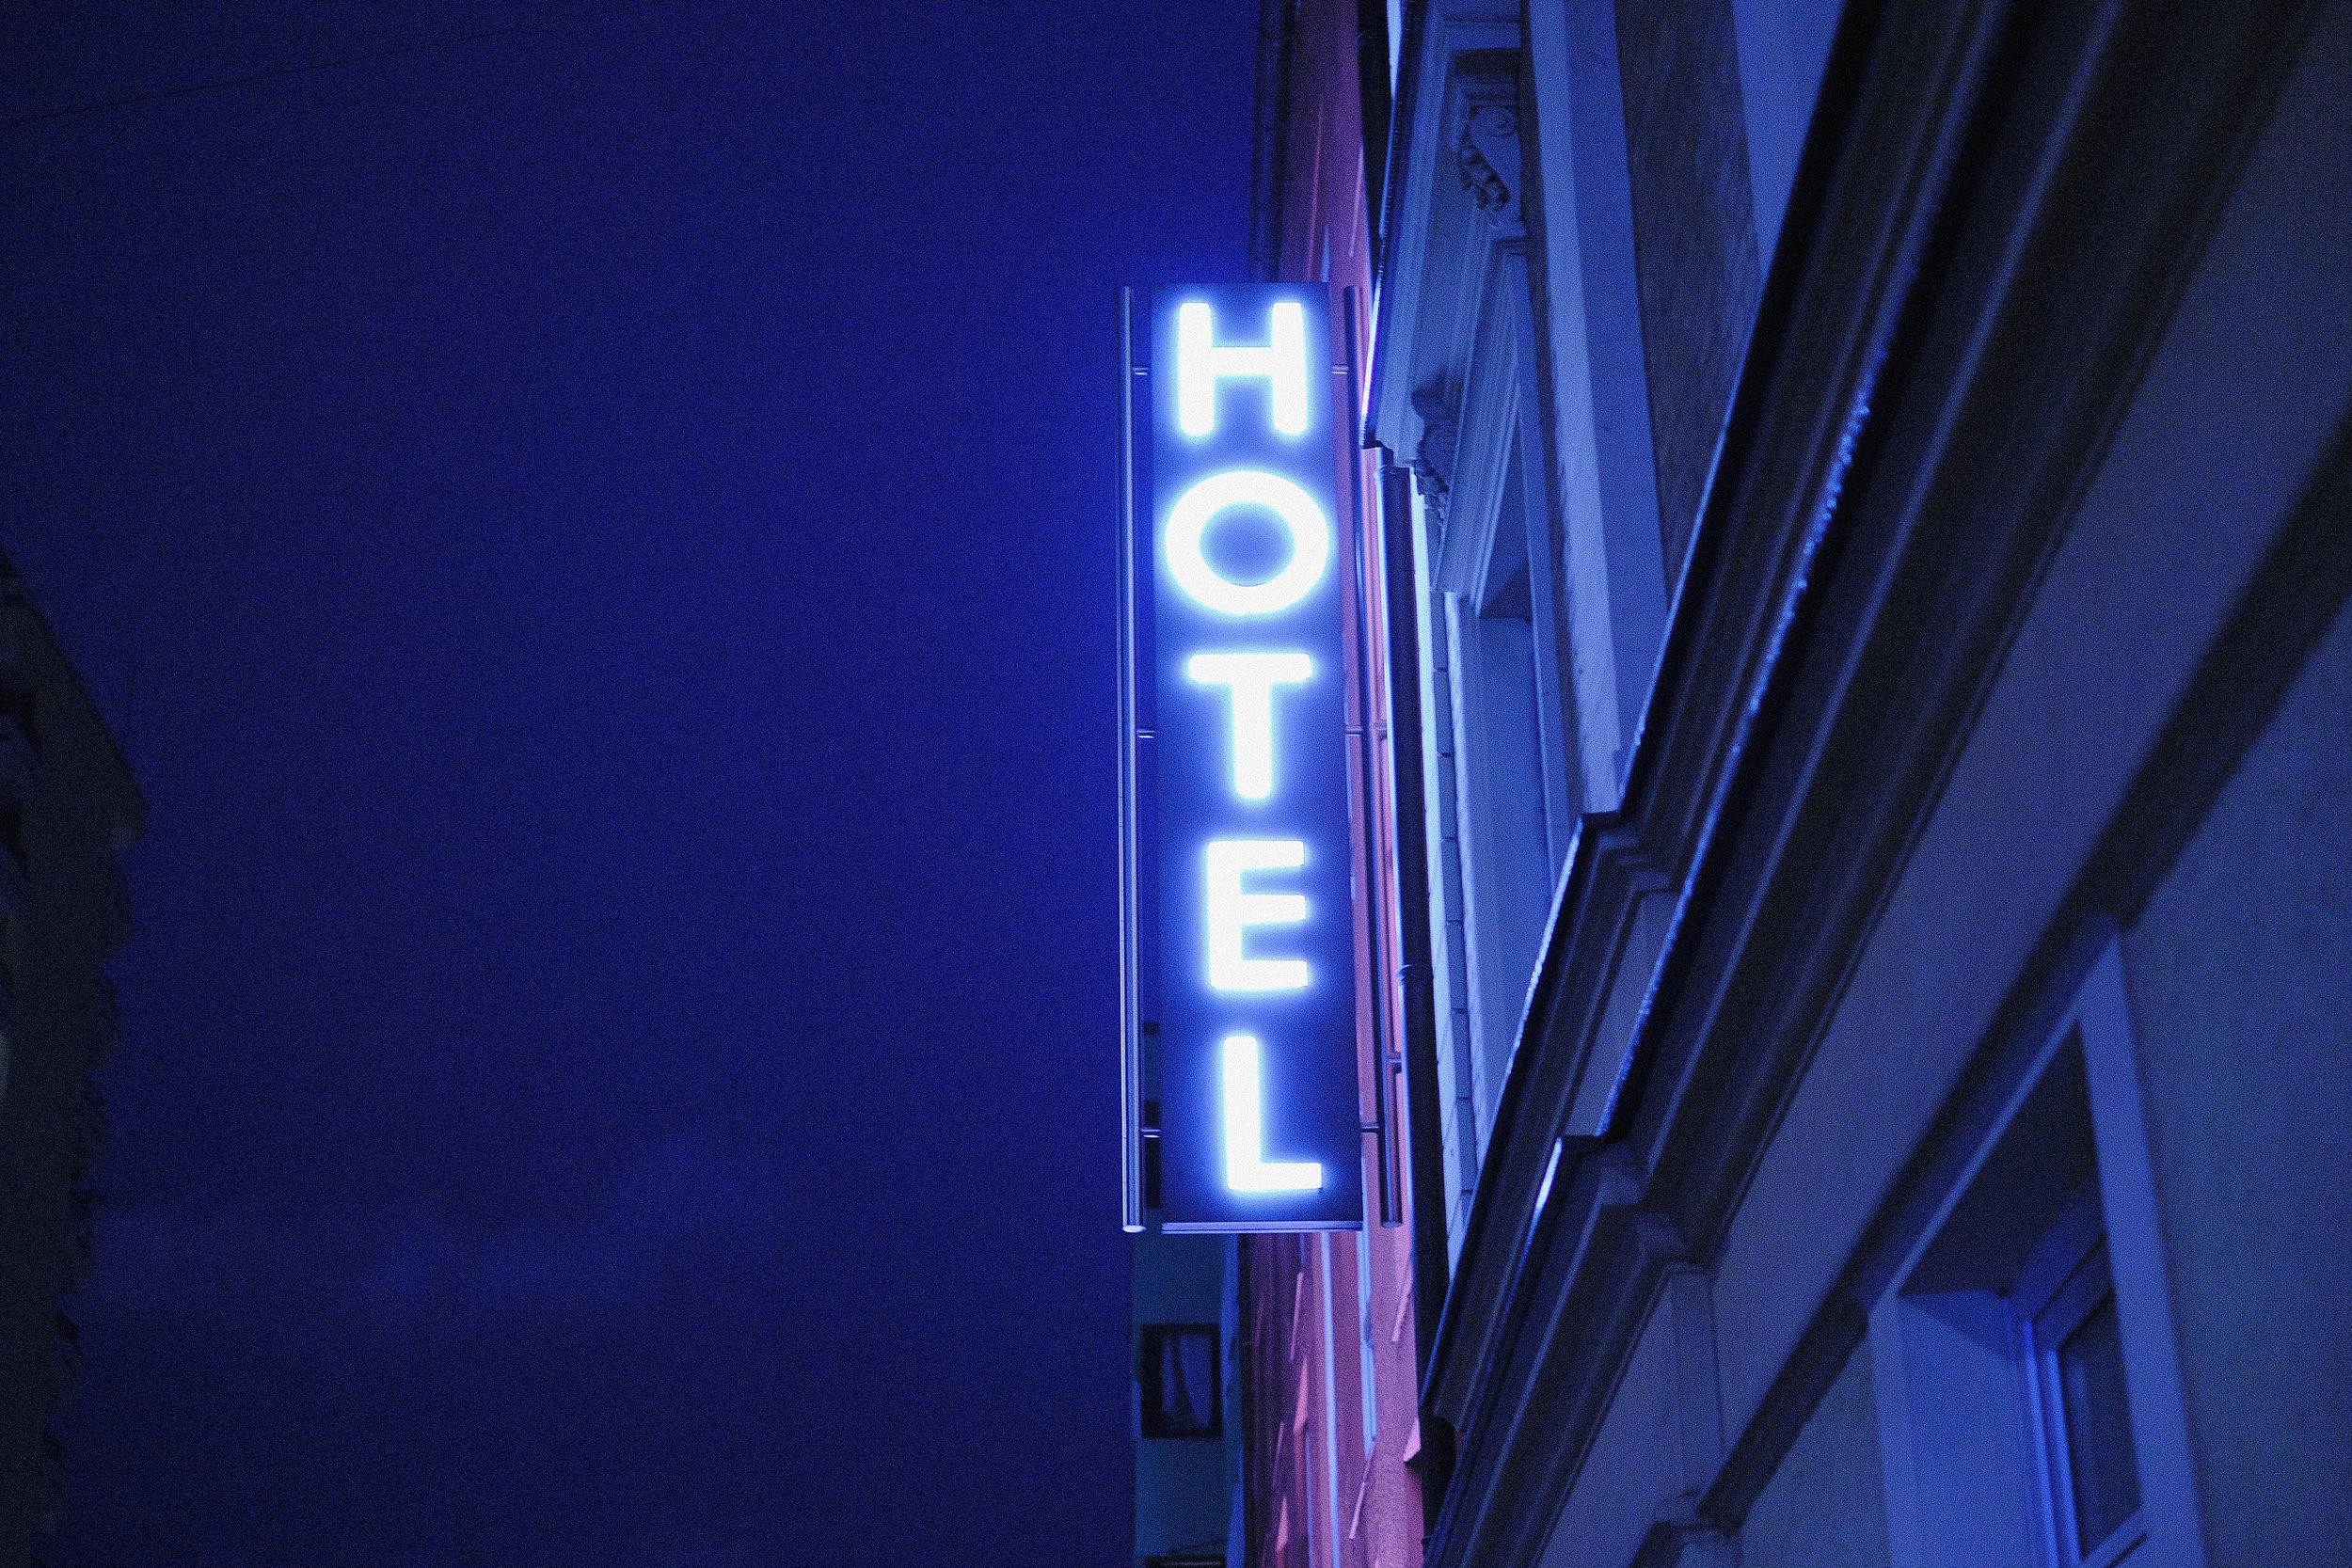 Premier Inn trials 'UK's first' battery-powered hotel in Edinburgh -